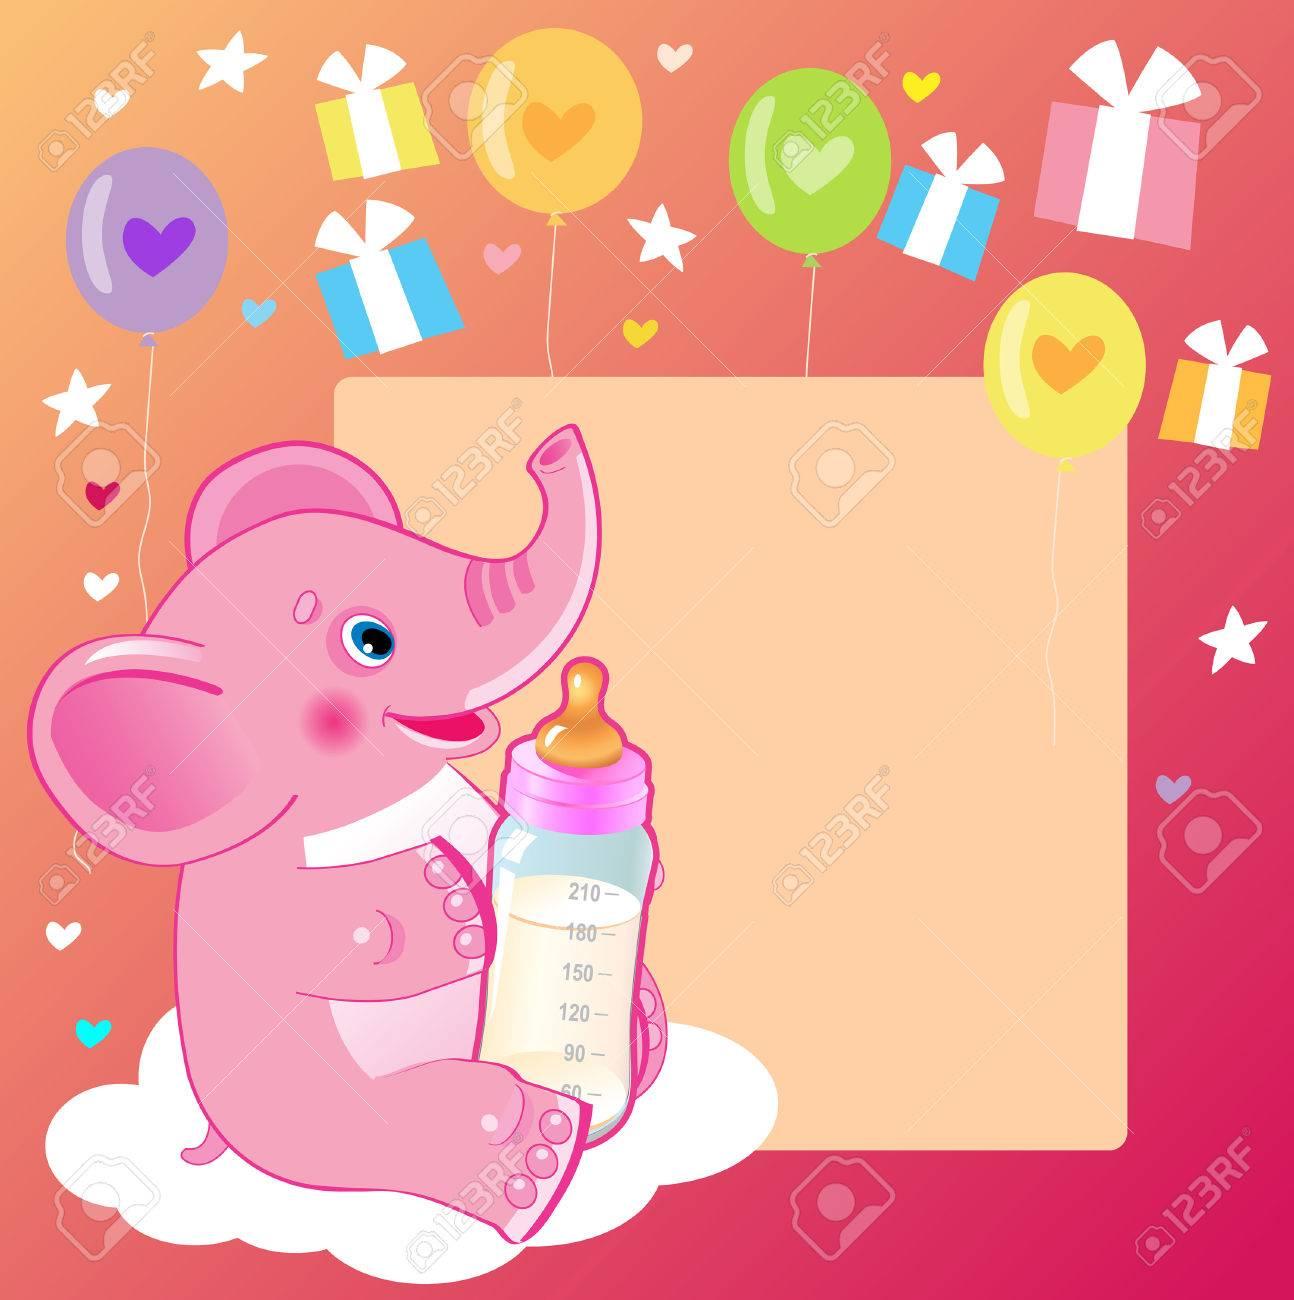 Elefante Lindo Con La Botella De Leche Bienvenido Tarjeta De La